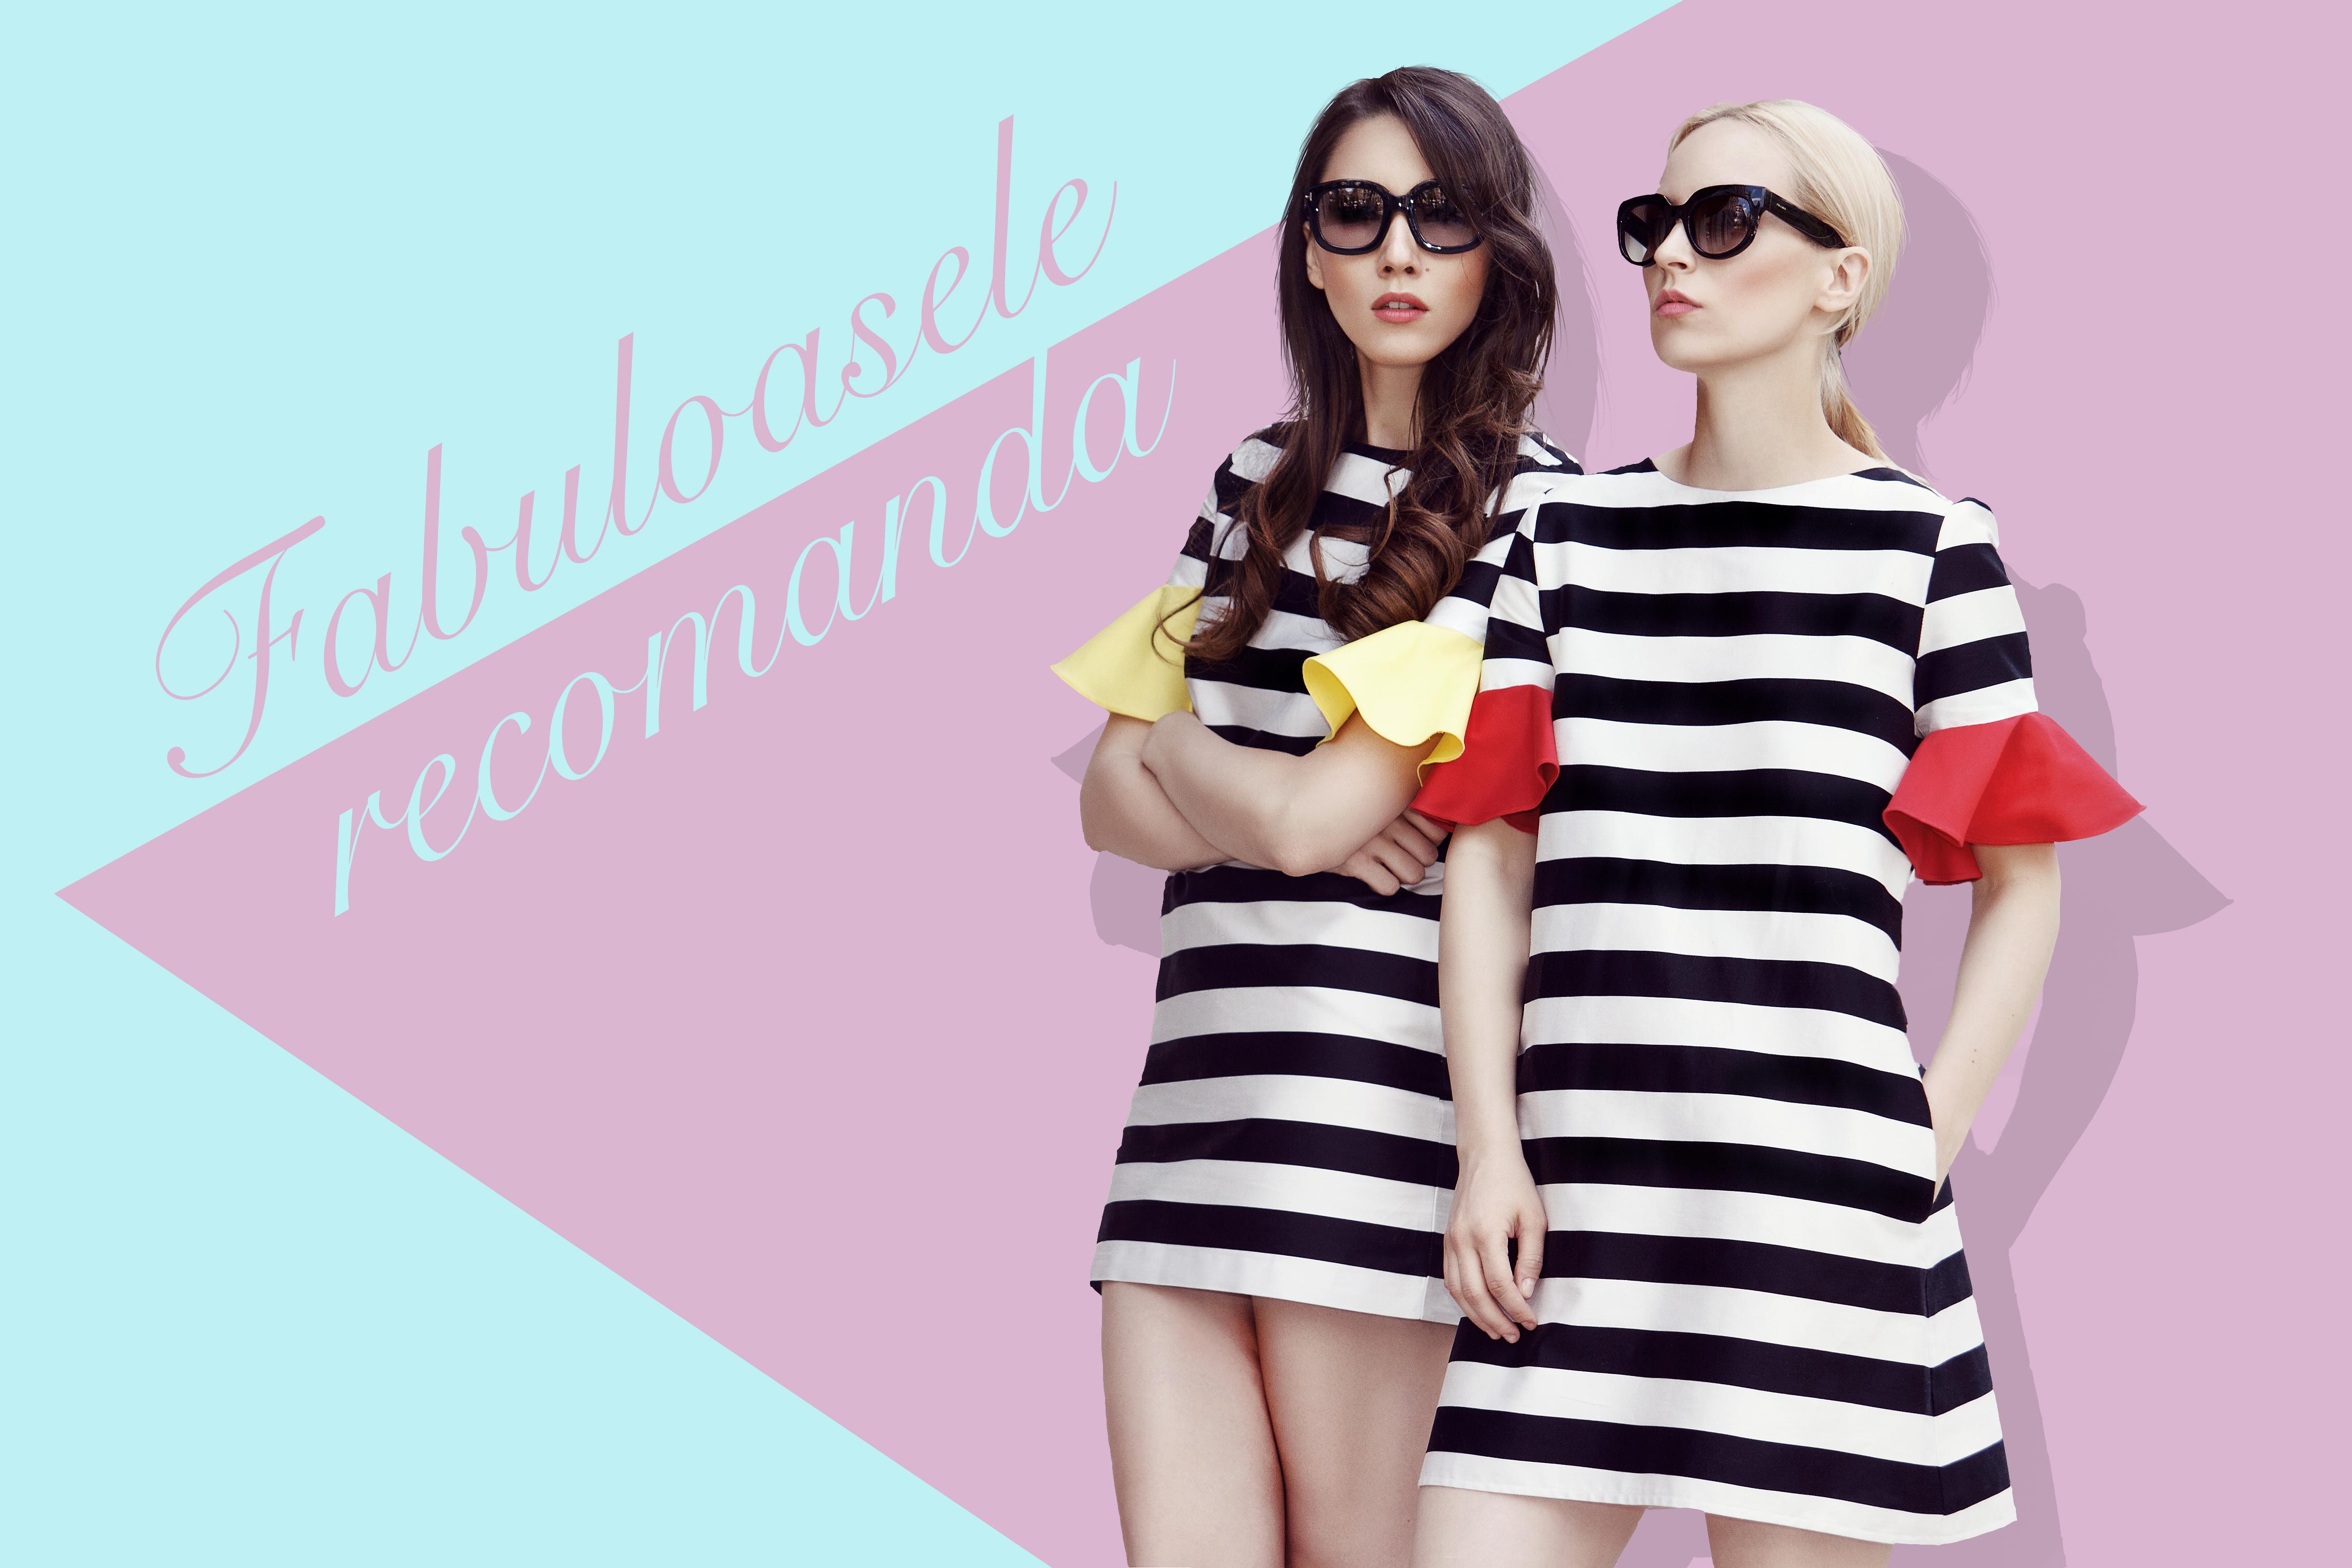 absolutely fabulous_shopping online emag_fabulous  muses_diana enciu_alina tanasa_emag ofert_campanie emga_fabuloasele (8)